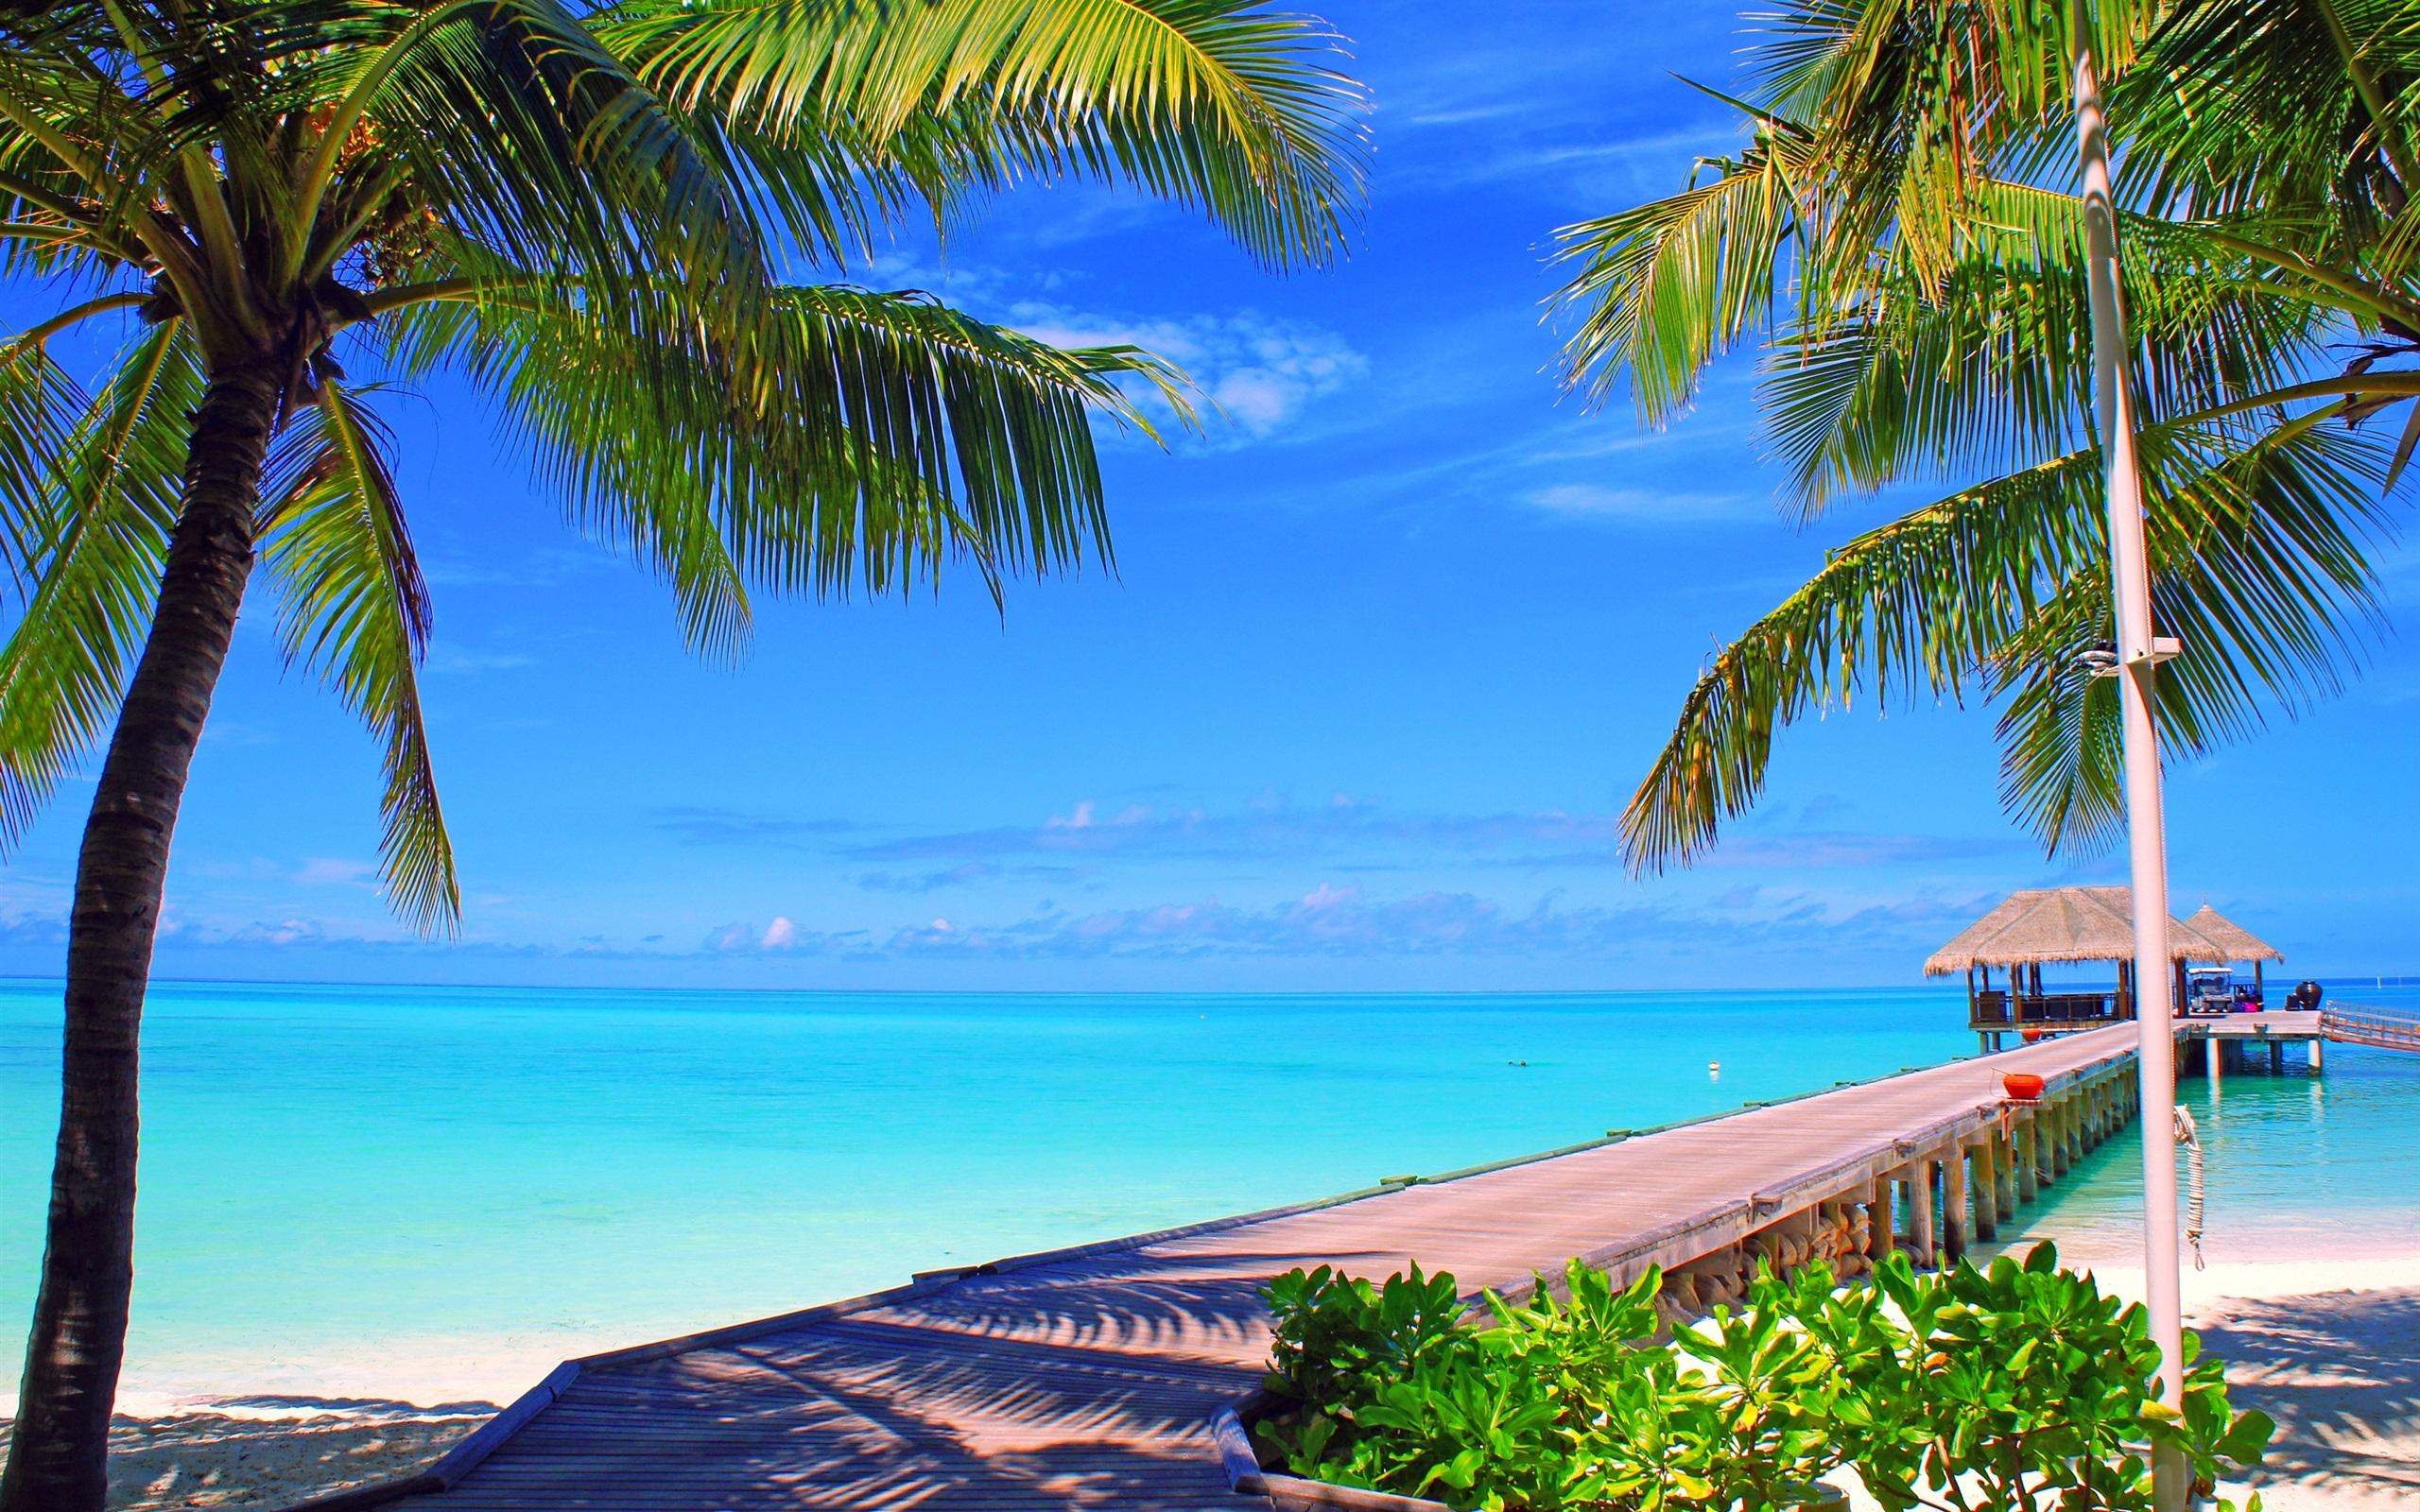 Wallpaper Maldives, Island, Palm Trees, Bridge, Bungalows, - Tropical Beach Background Hd - HD Wallpaper